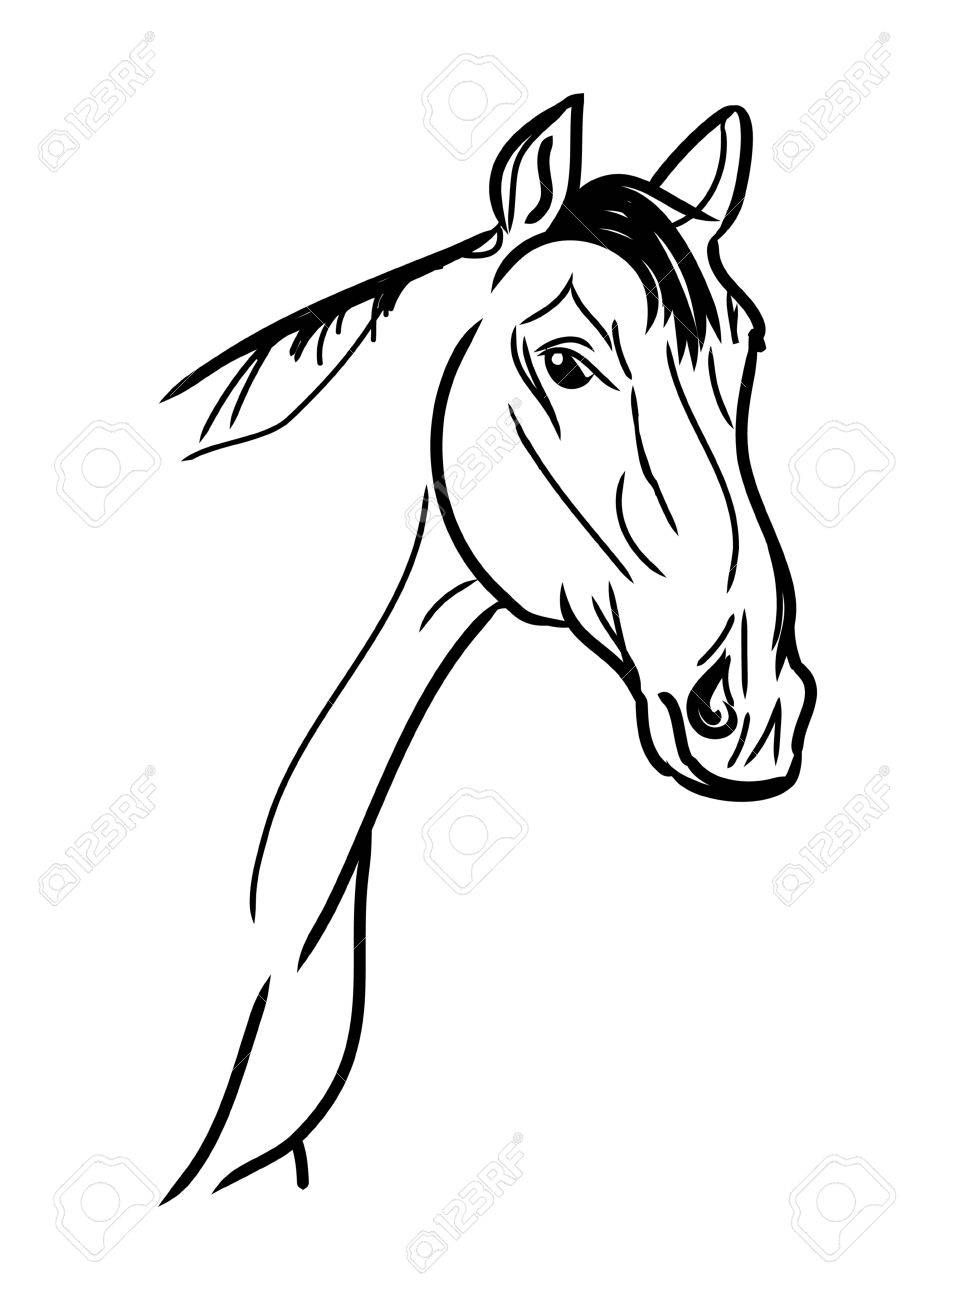 975x1300 Arabian Horse, Horse (Arab, Head). Drawing By Hand. Royalty Free